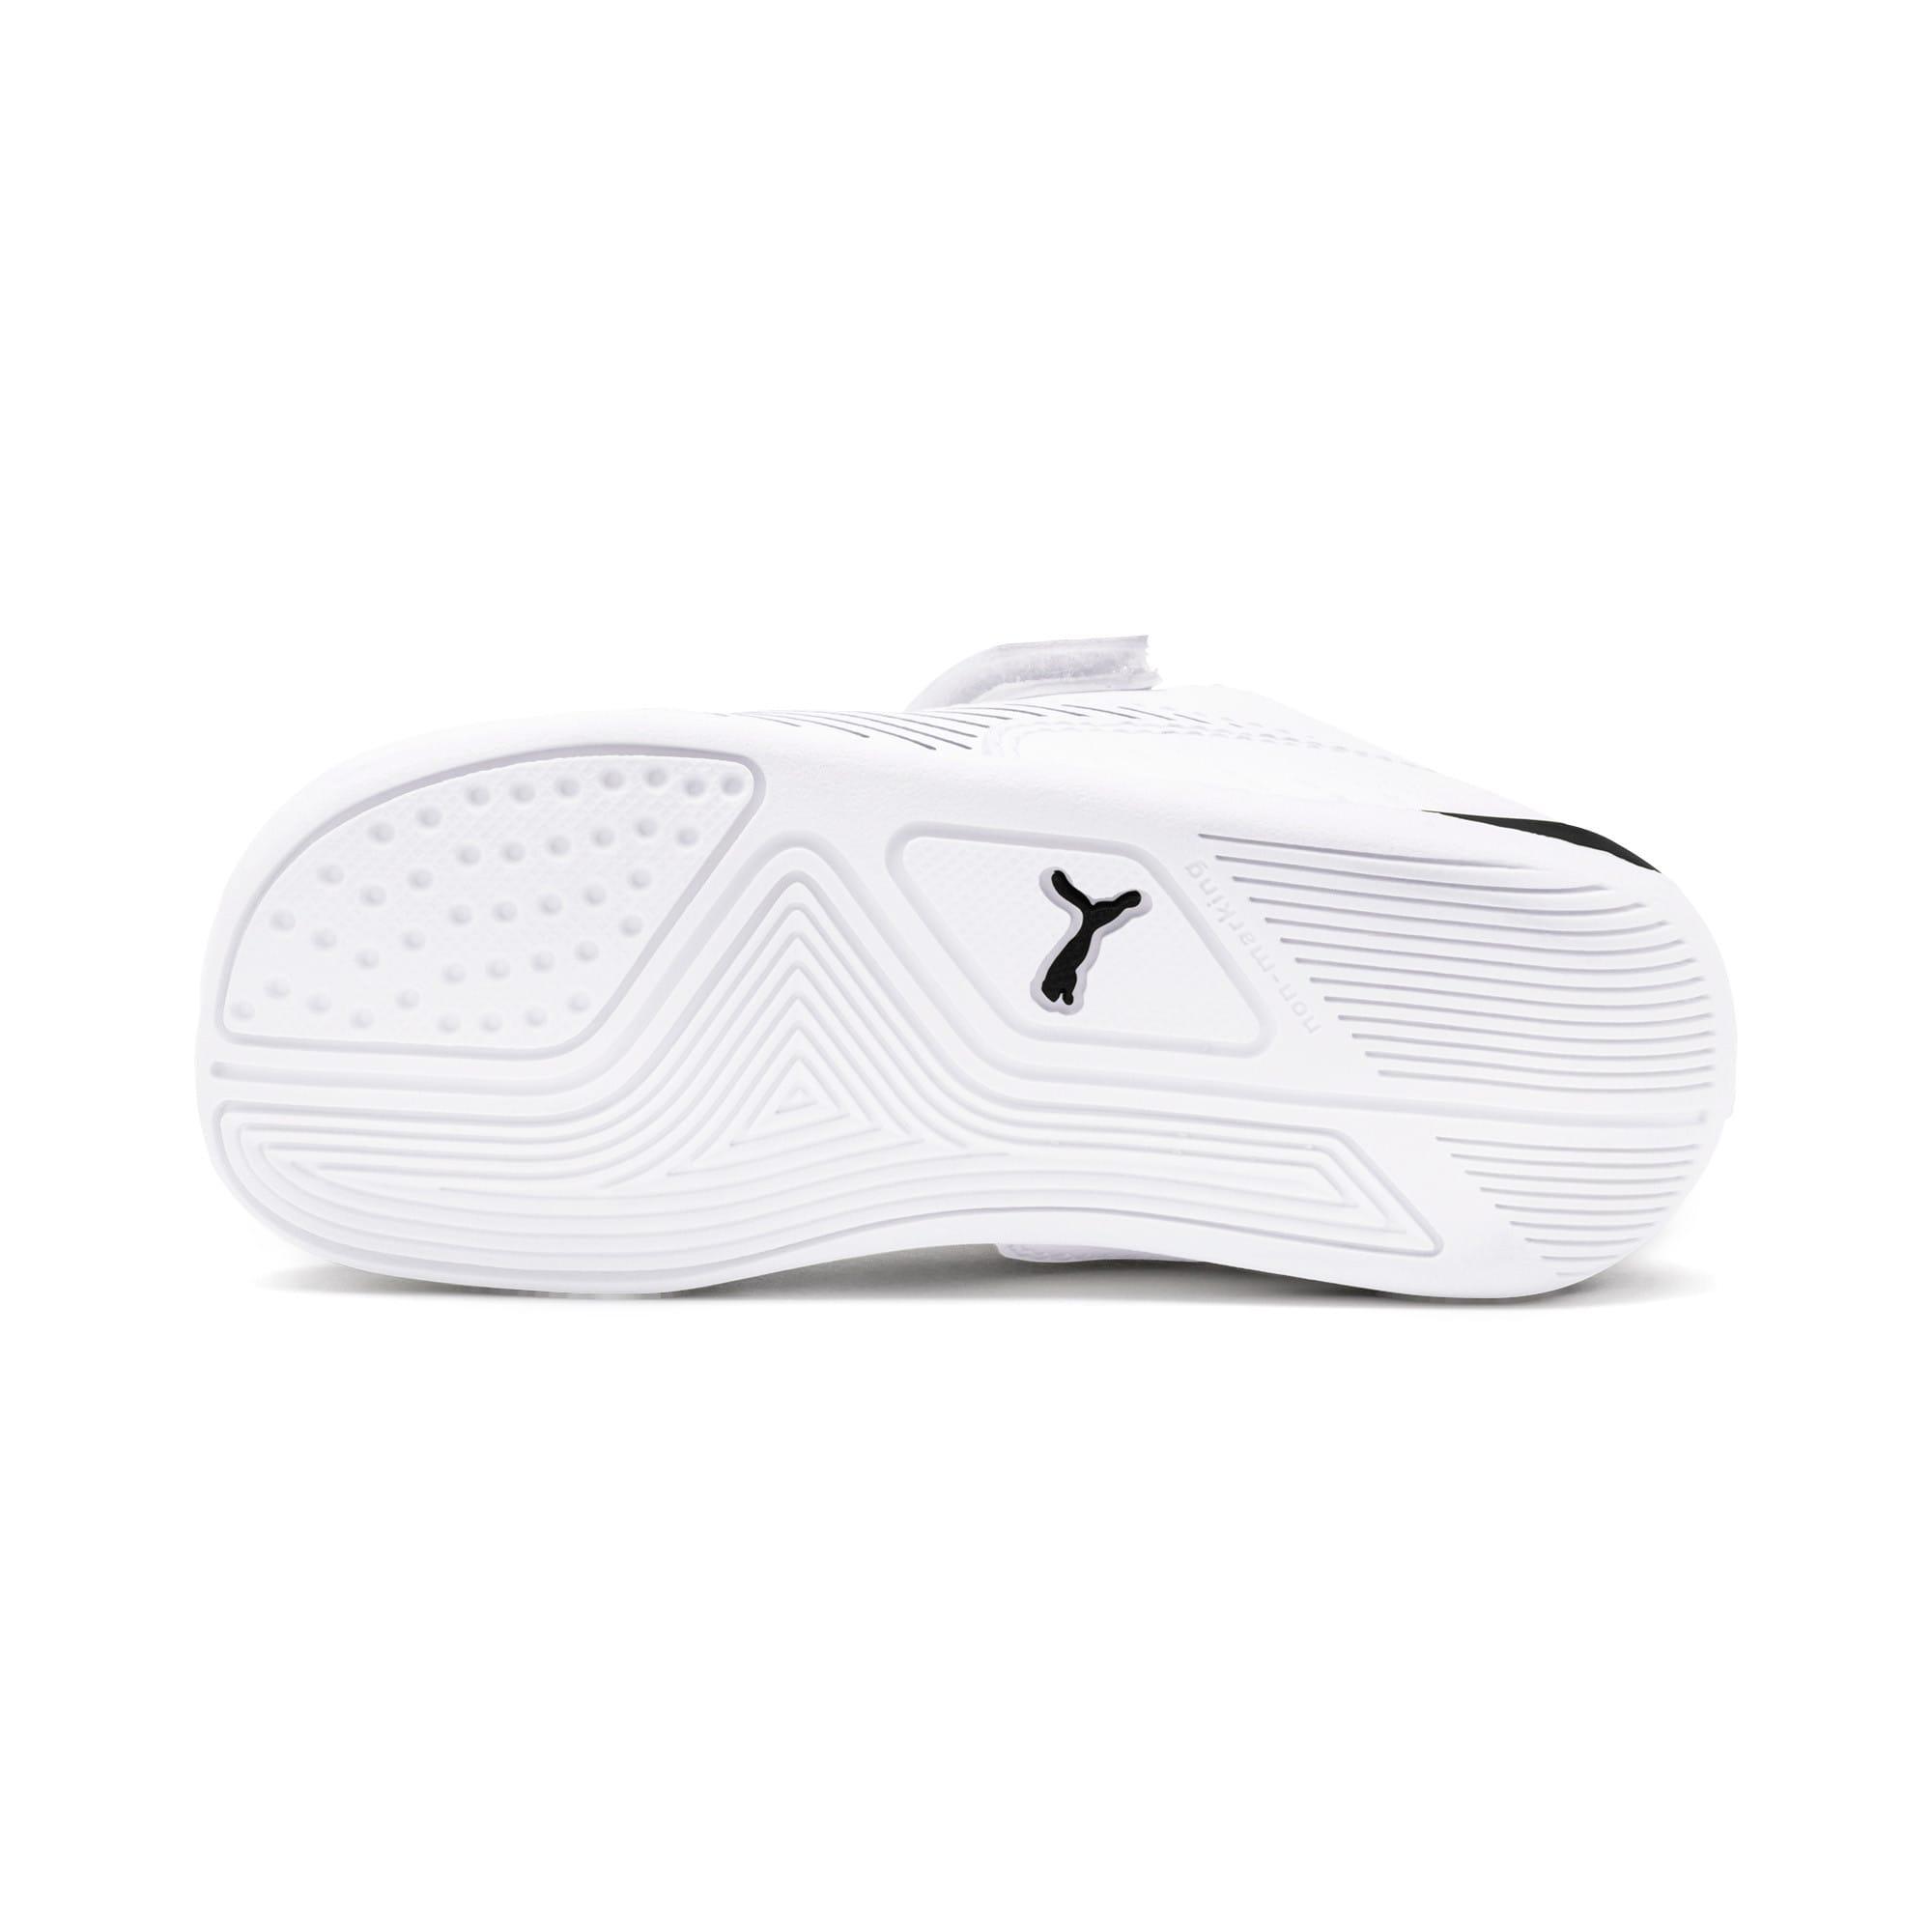 Thumbnail 4 of Scuderia Ferrari Drift Cat 7S Ultra Toddler Shoes, Puma White-Puma Black, medium